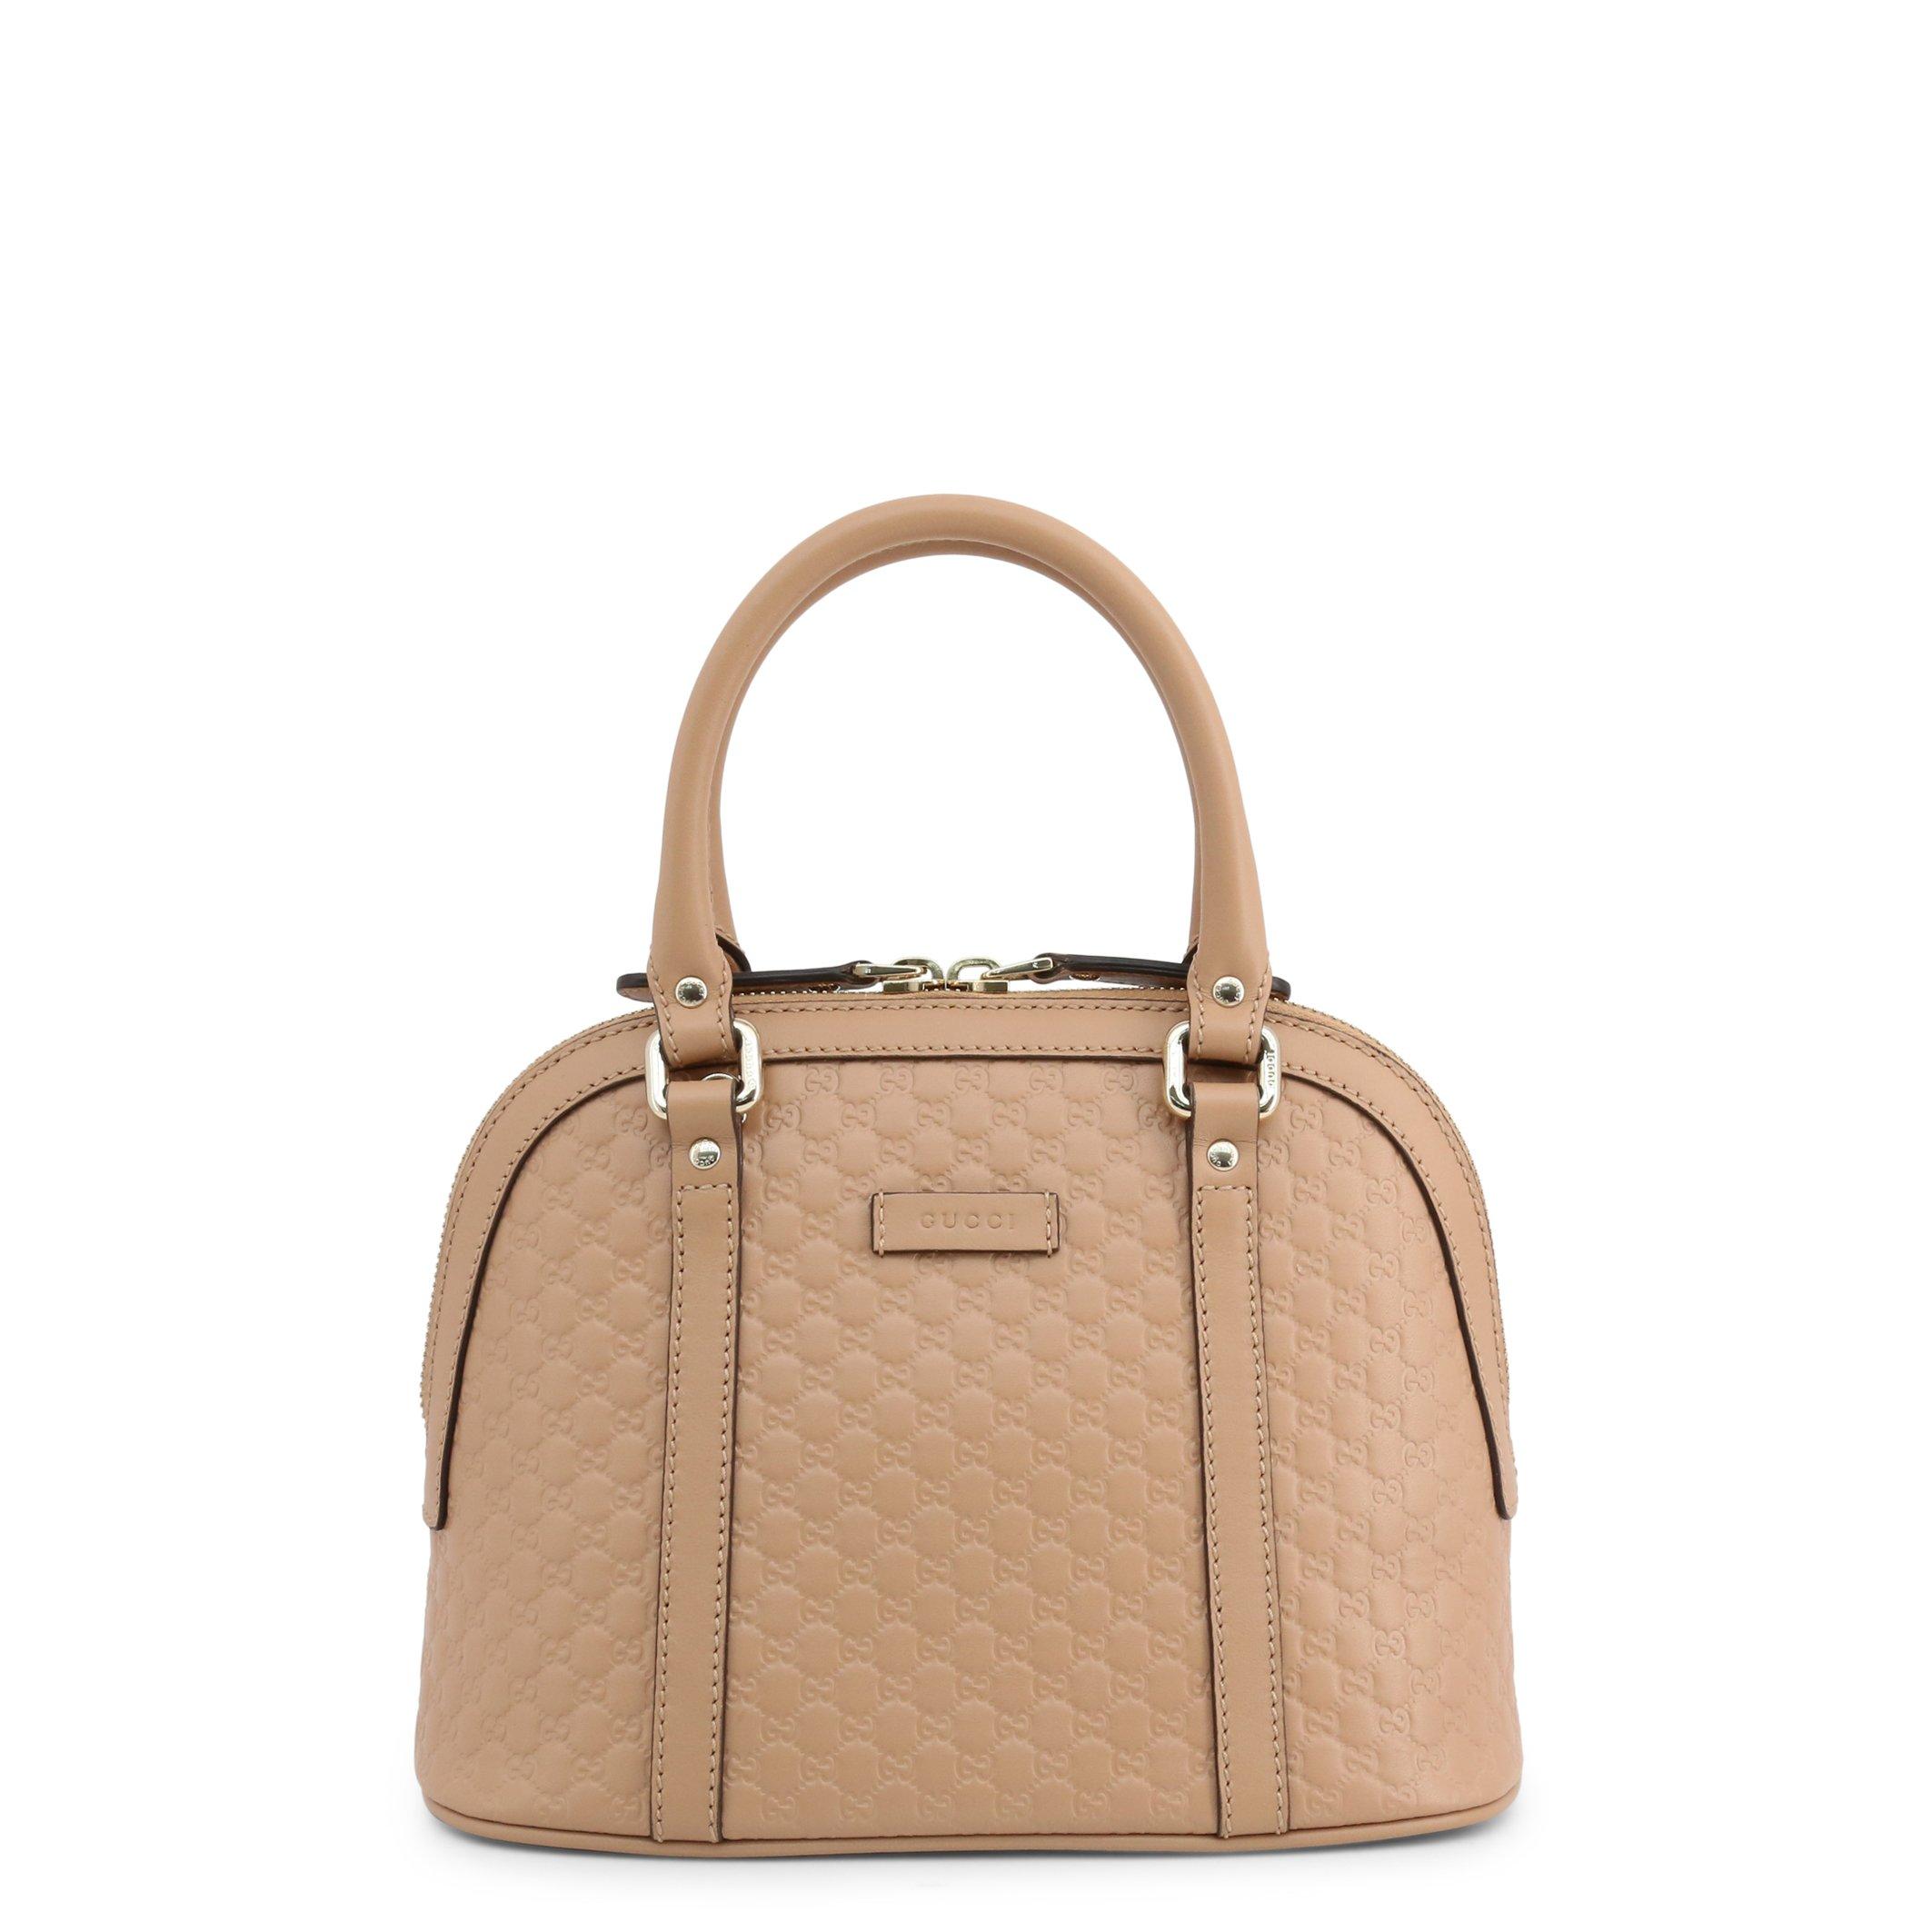 Gucci Women's Handbag Black 449654 - brown NOSIZE